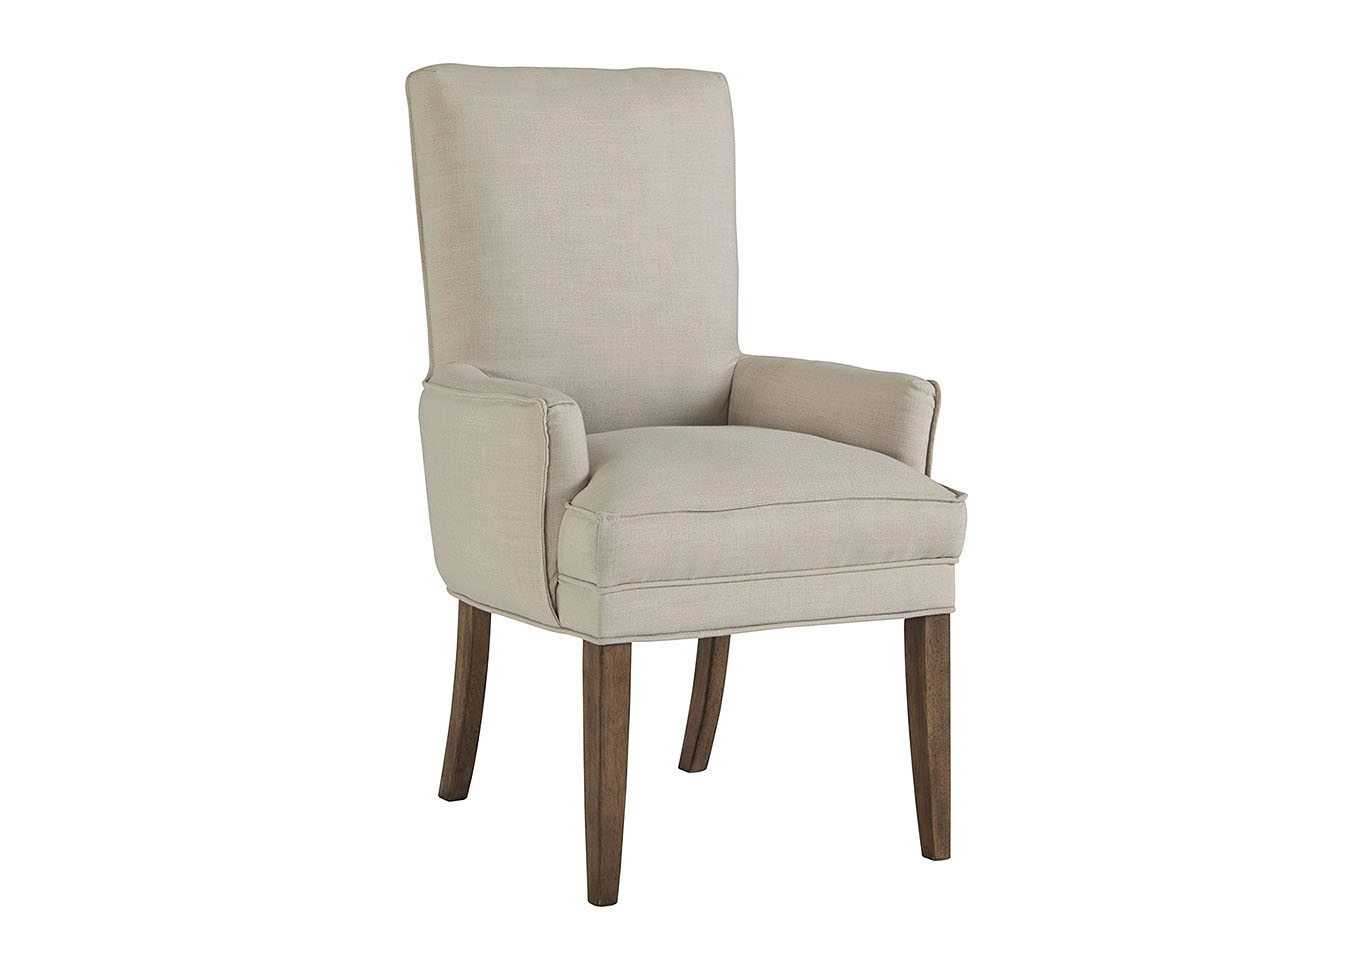 Grindleburg Dark Brown Beige Dining Upholstered Arm Chair Set Of 2Signature